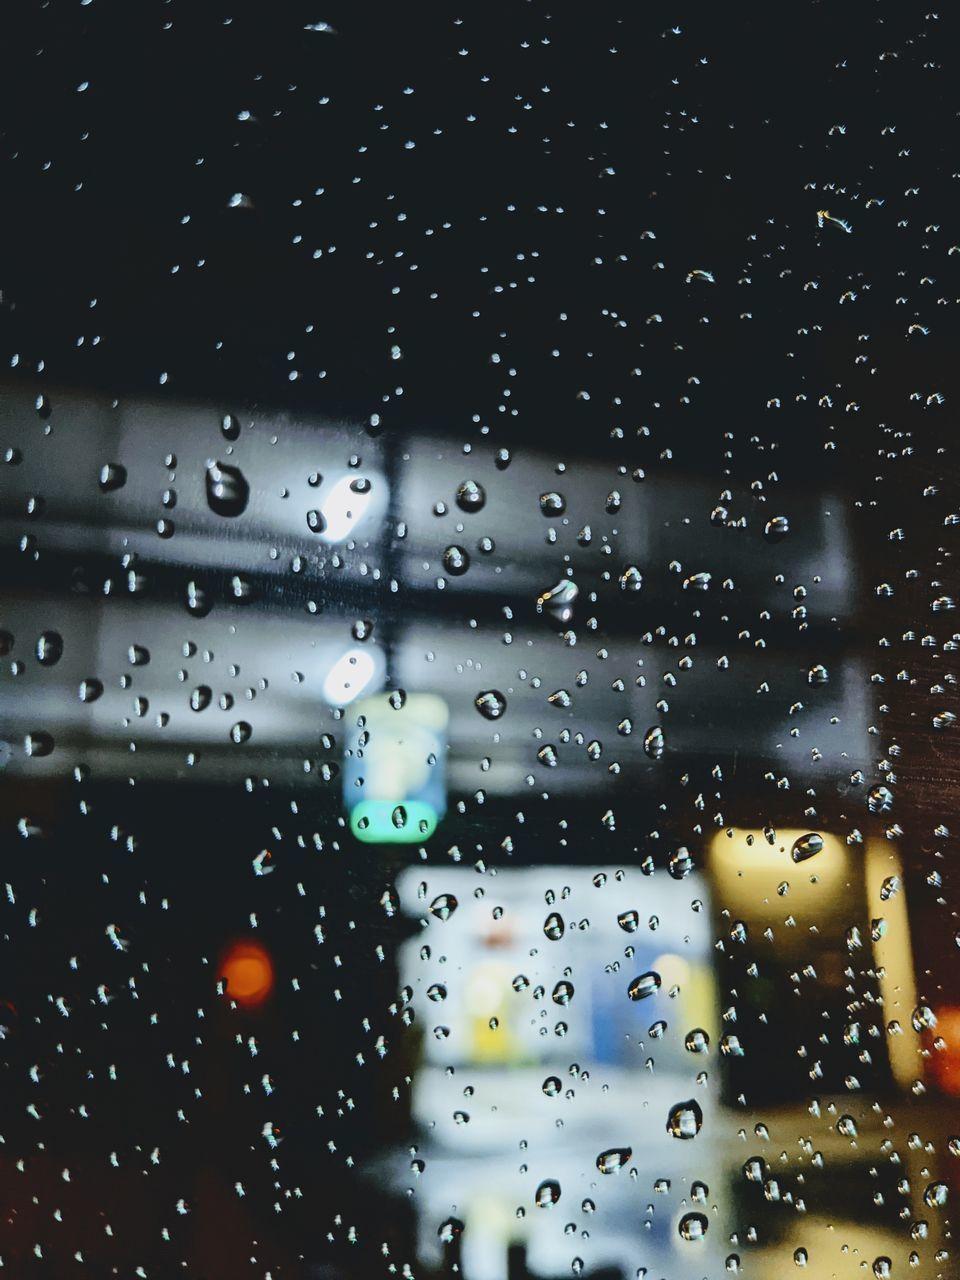 FULL FRAME SHOT OF WET GLASS WINDOW WITH RAIN DROPS